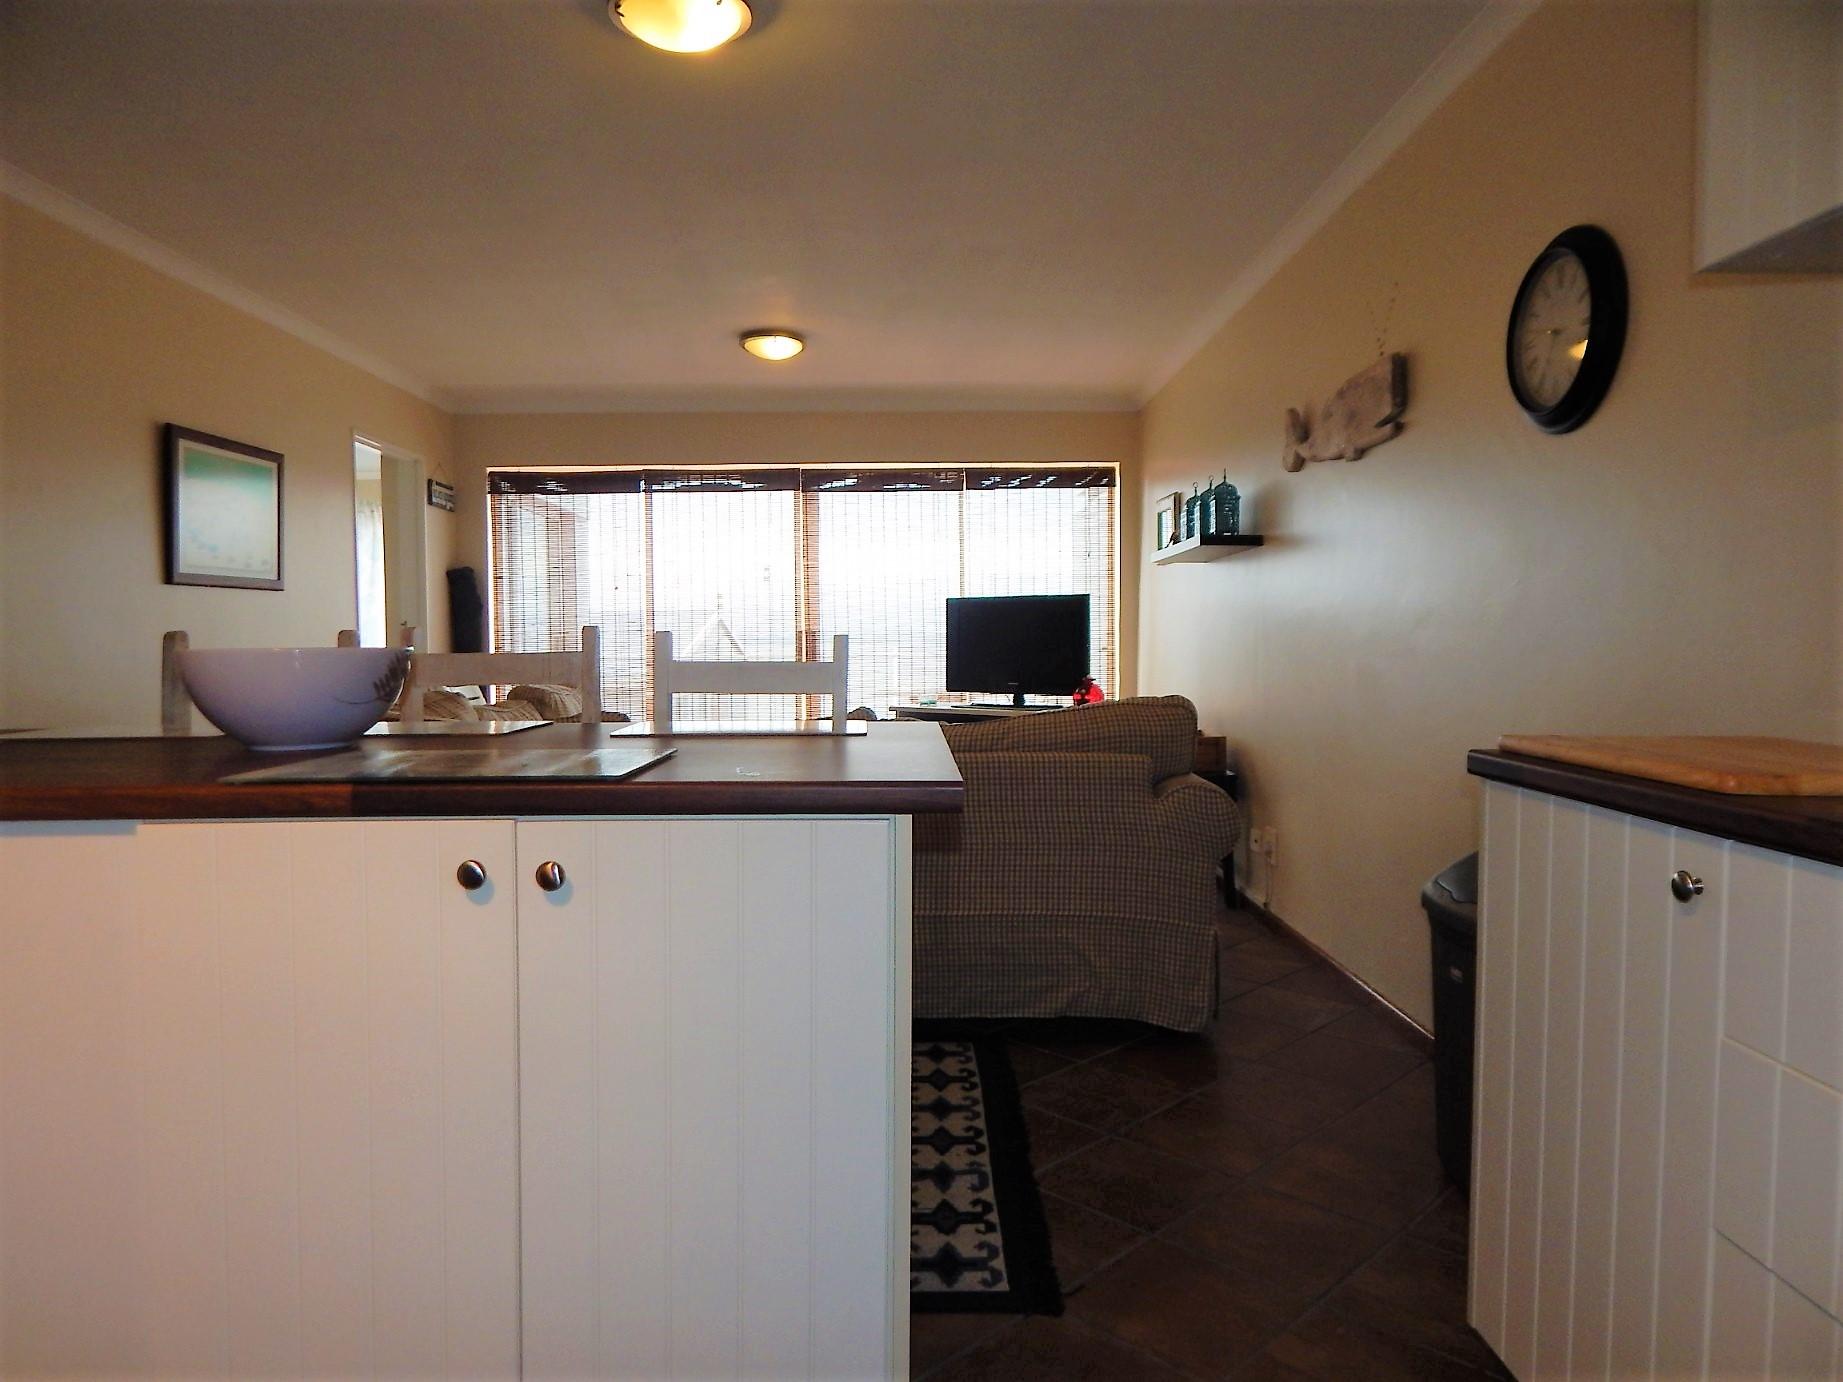 3 Bedroom Apartment for sale in De Bakke ENT0066483 : photo#8